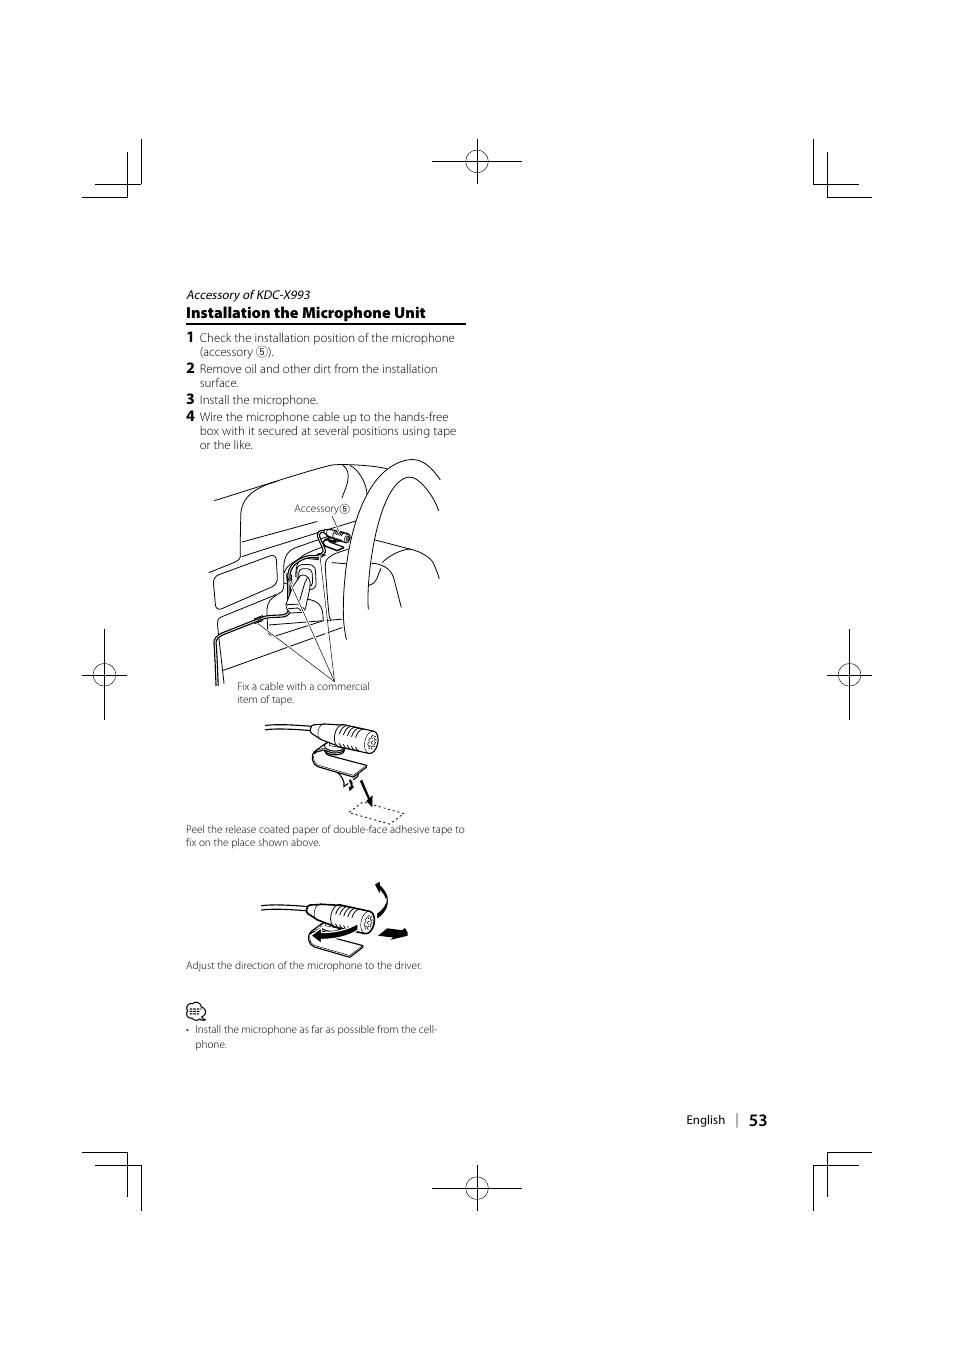 Kenwood KDC-MP642U User Manual | Page 53 / 60 | Original mode | Also for: eXcelon  KDC-X993, eXcelon KDC-X693  Manuals Directory